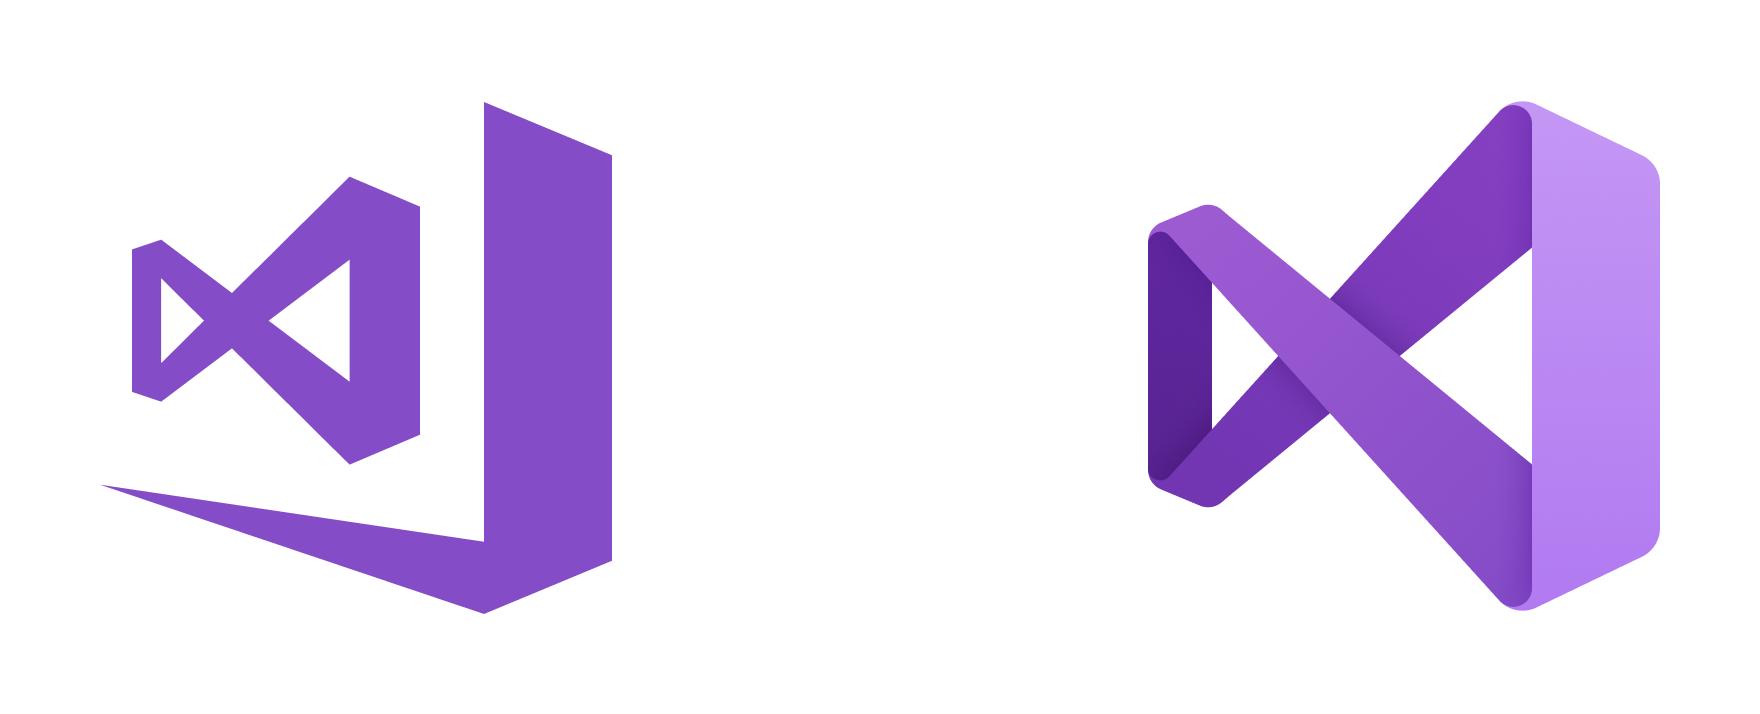 What's new in Visual Studio 2019 design